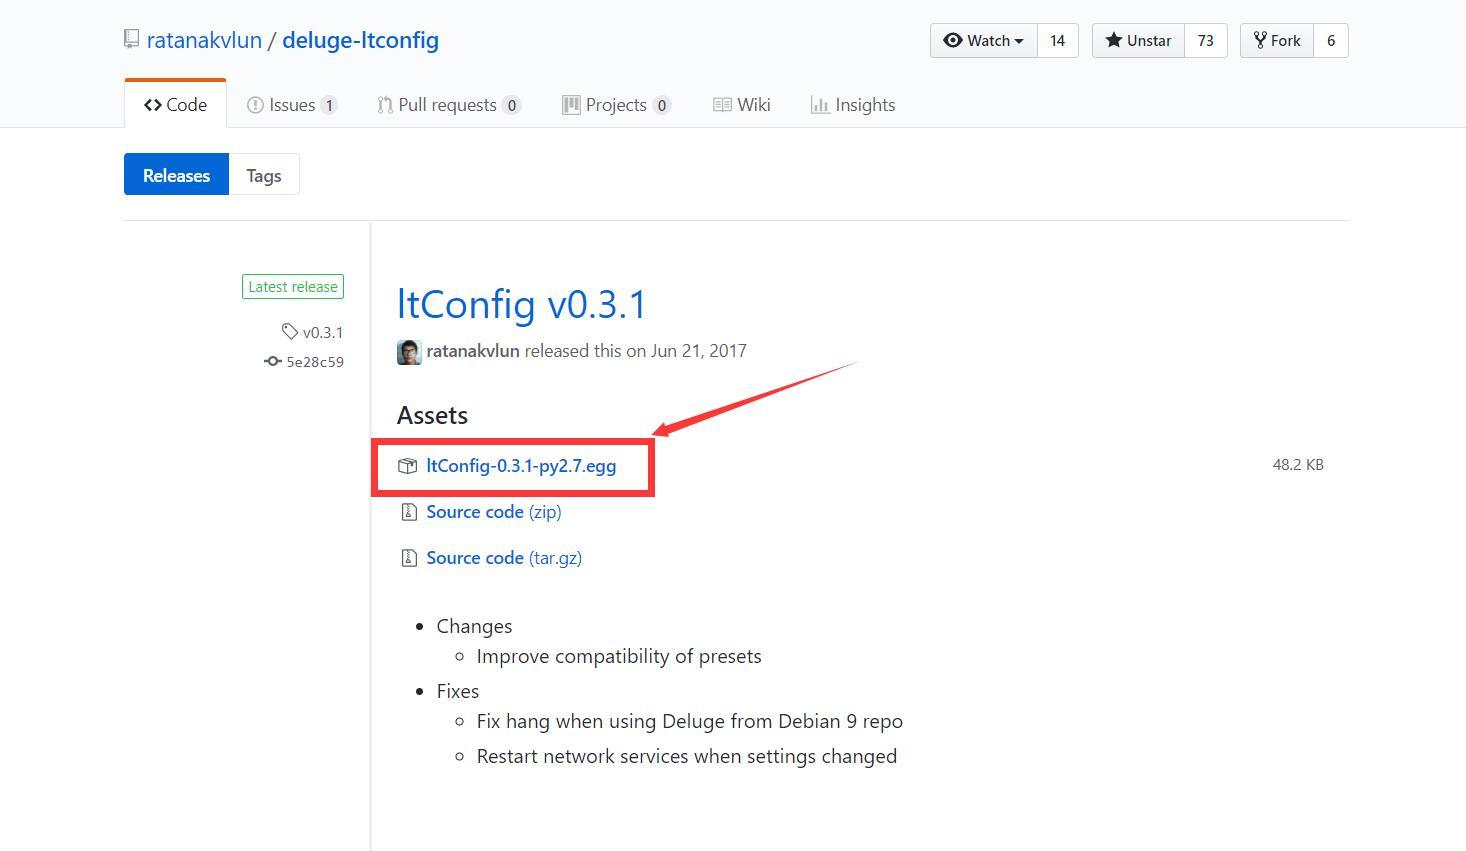 download_itconfig.jpg